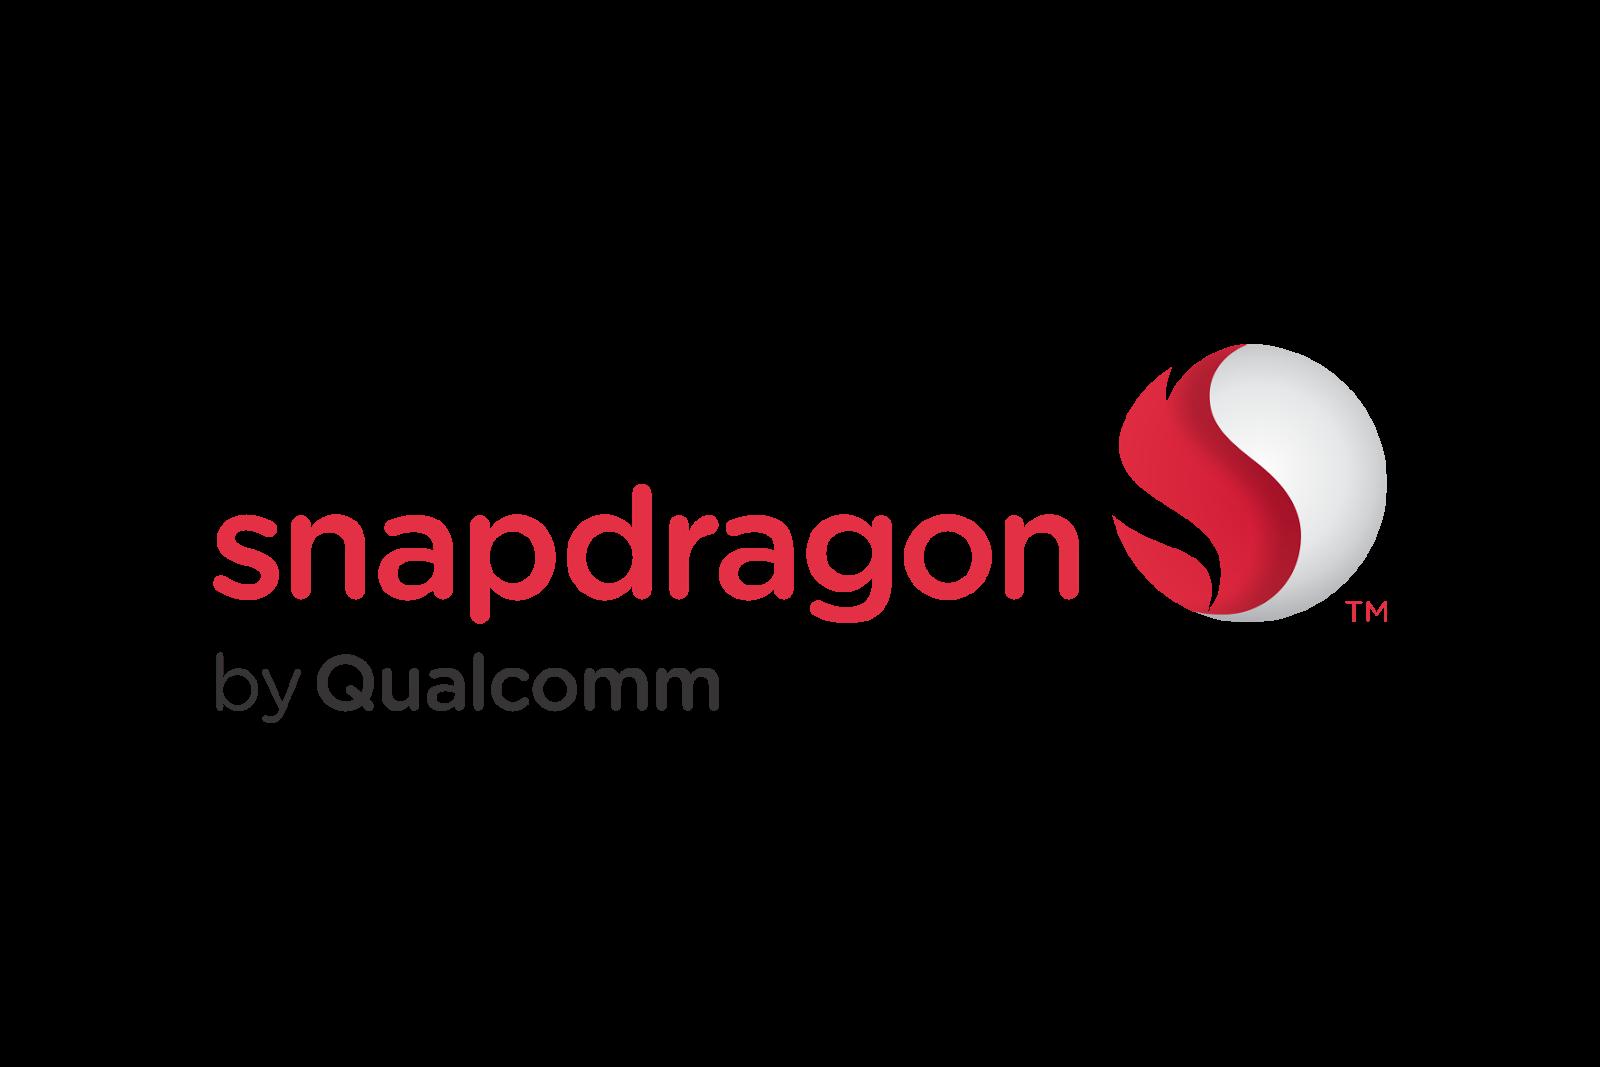 Qualcomm Logo Vector Qualcomm Snapdragon Lo...